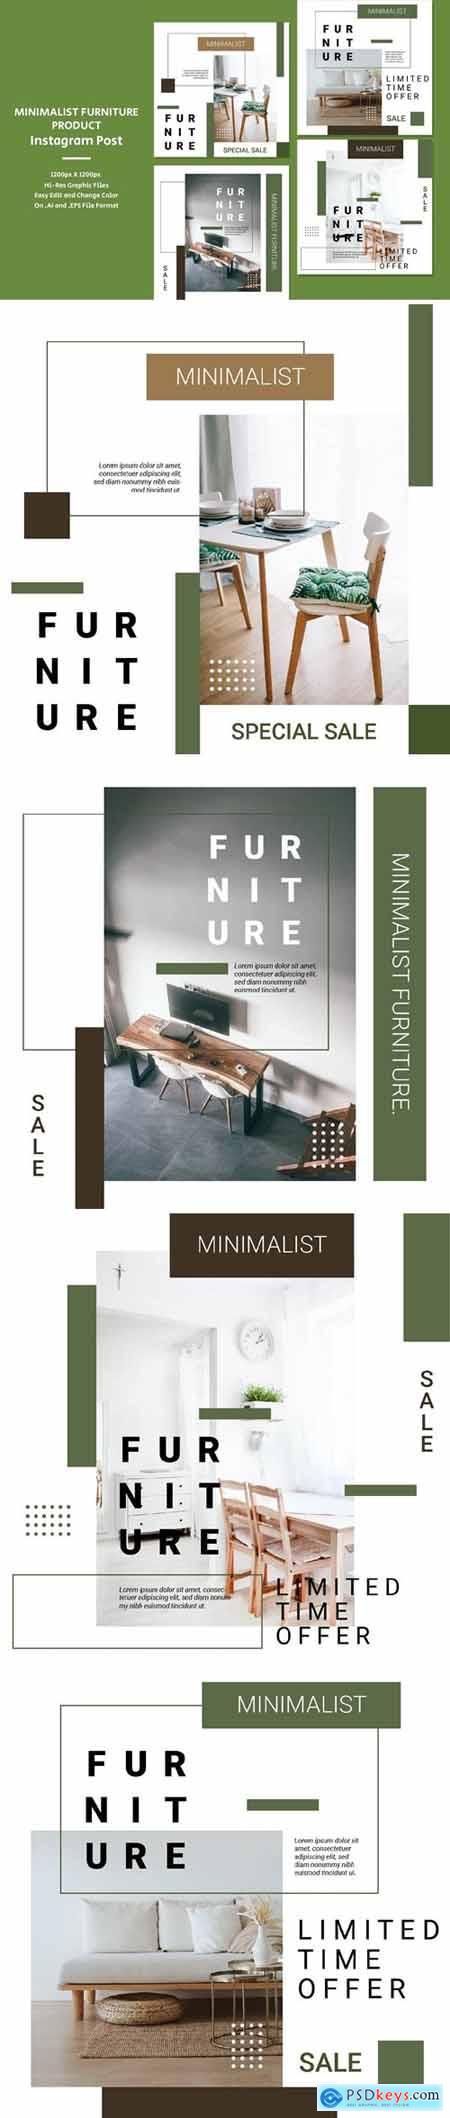 Minimalist Furniture Product